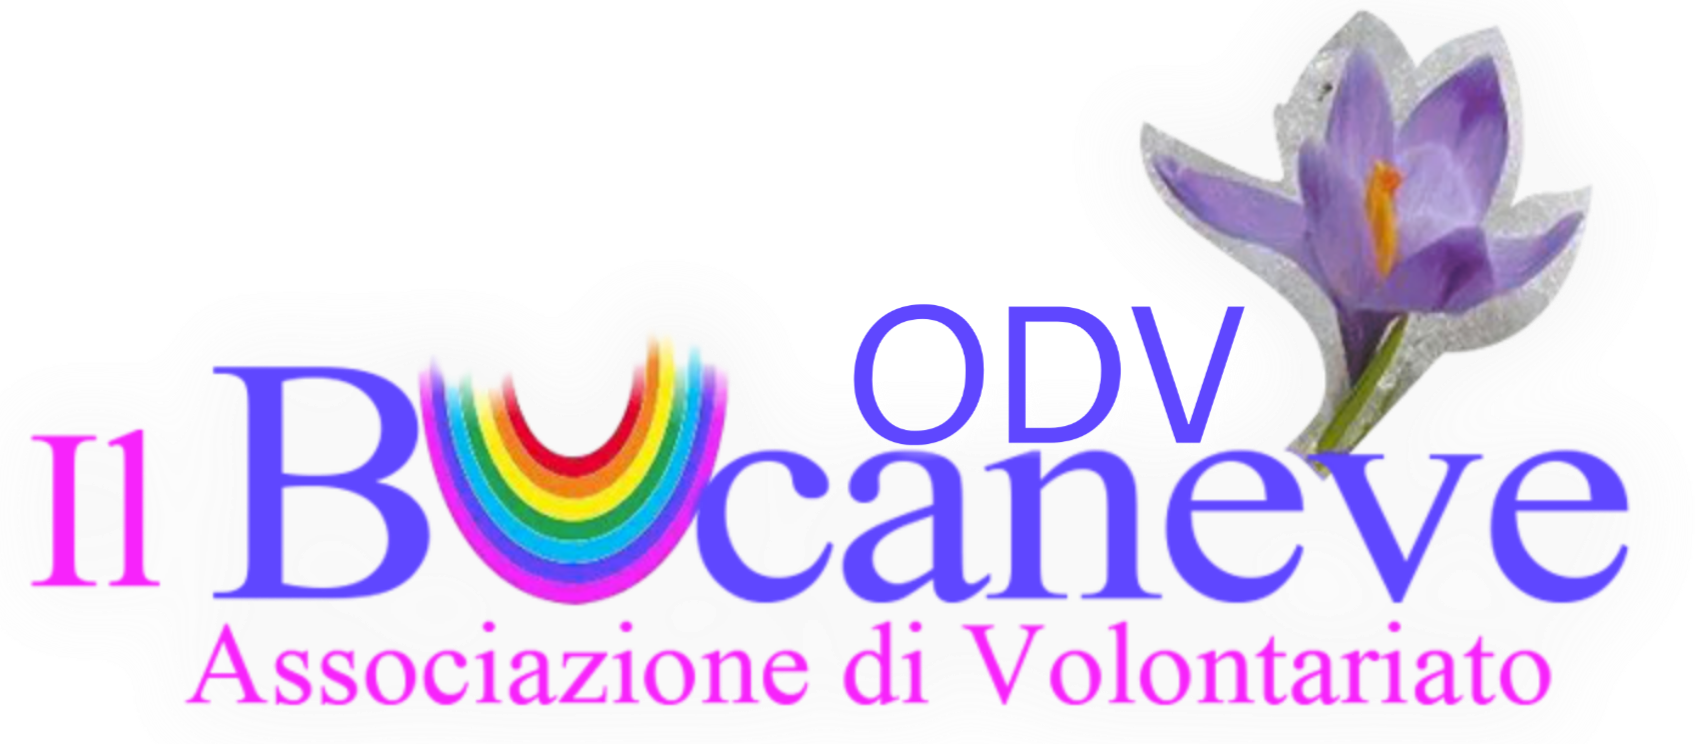 Associazione Volontariato Onlus